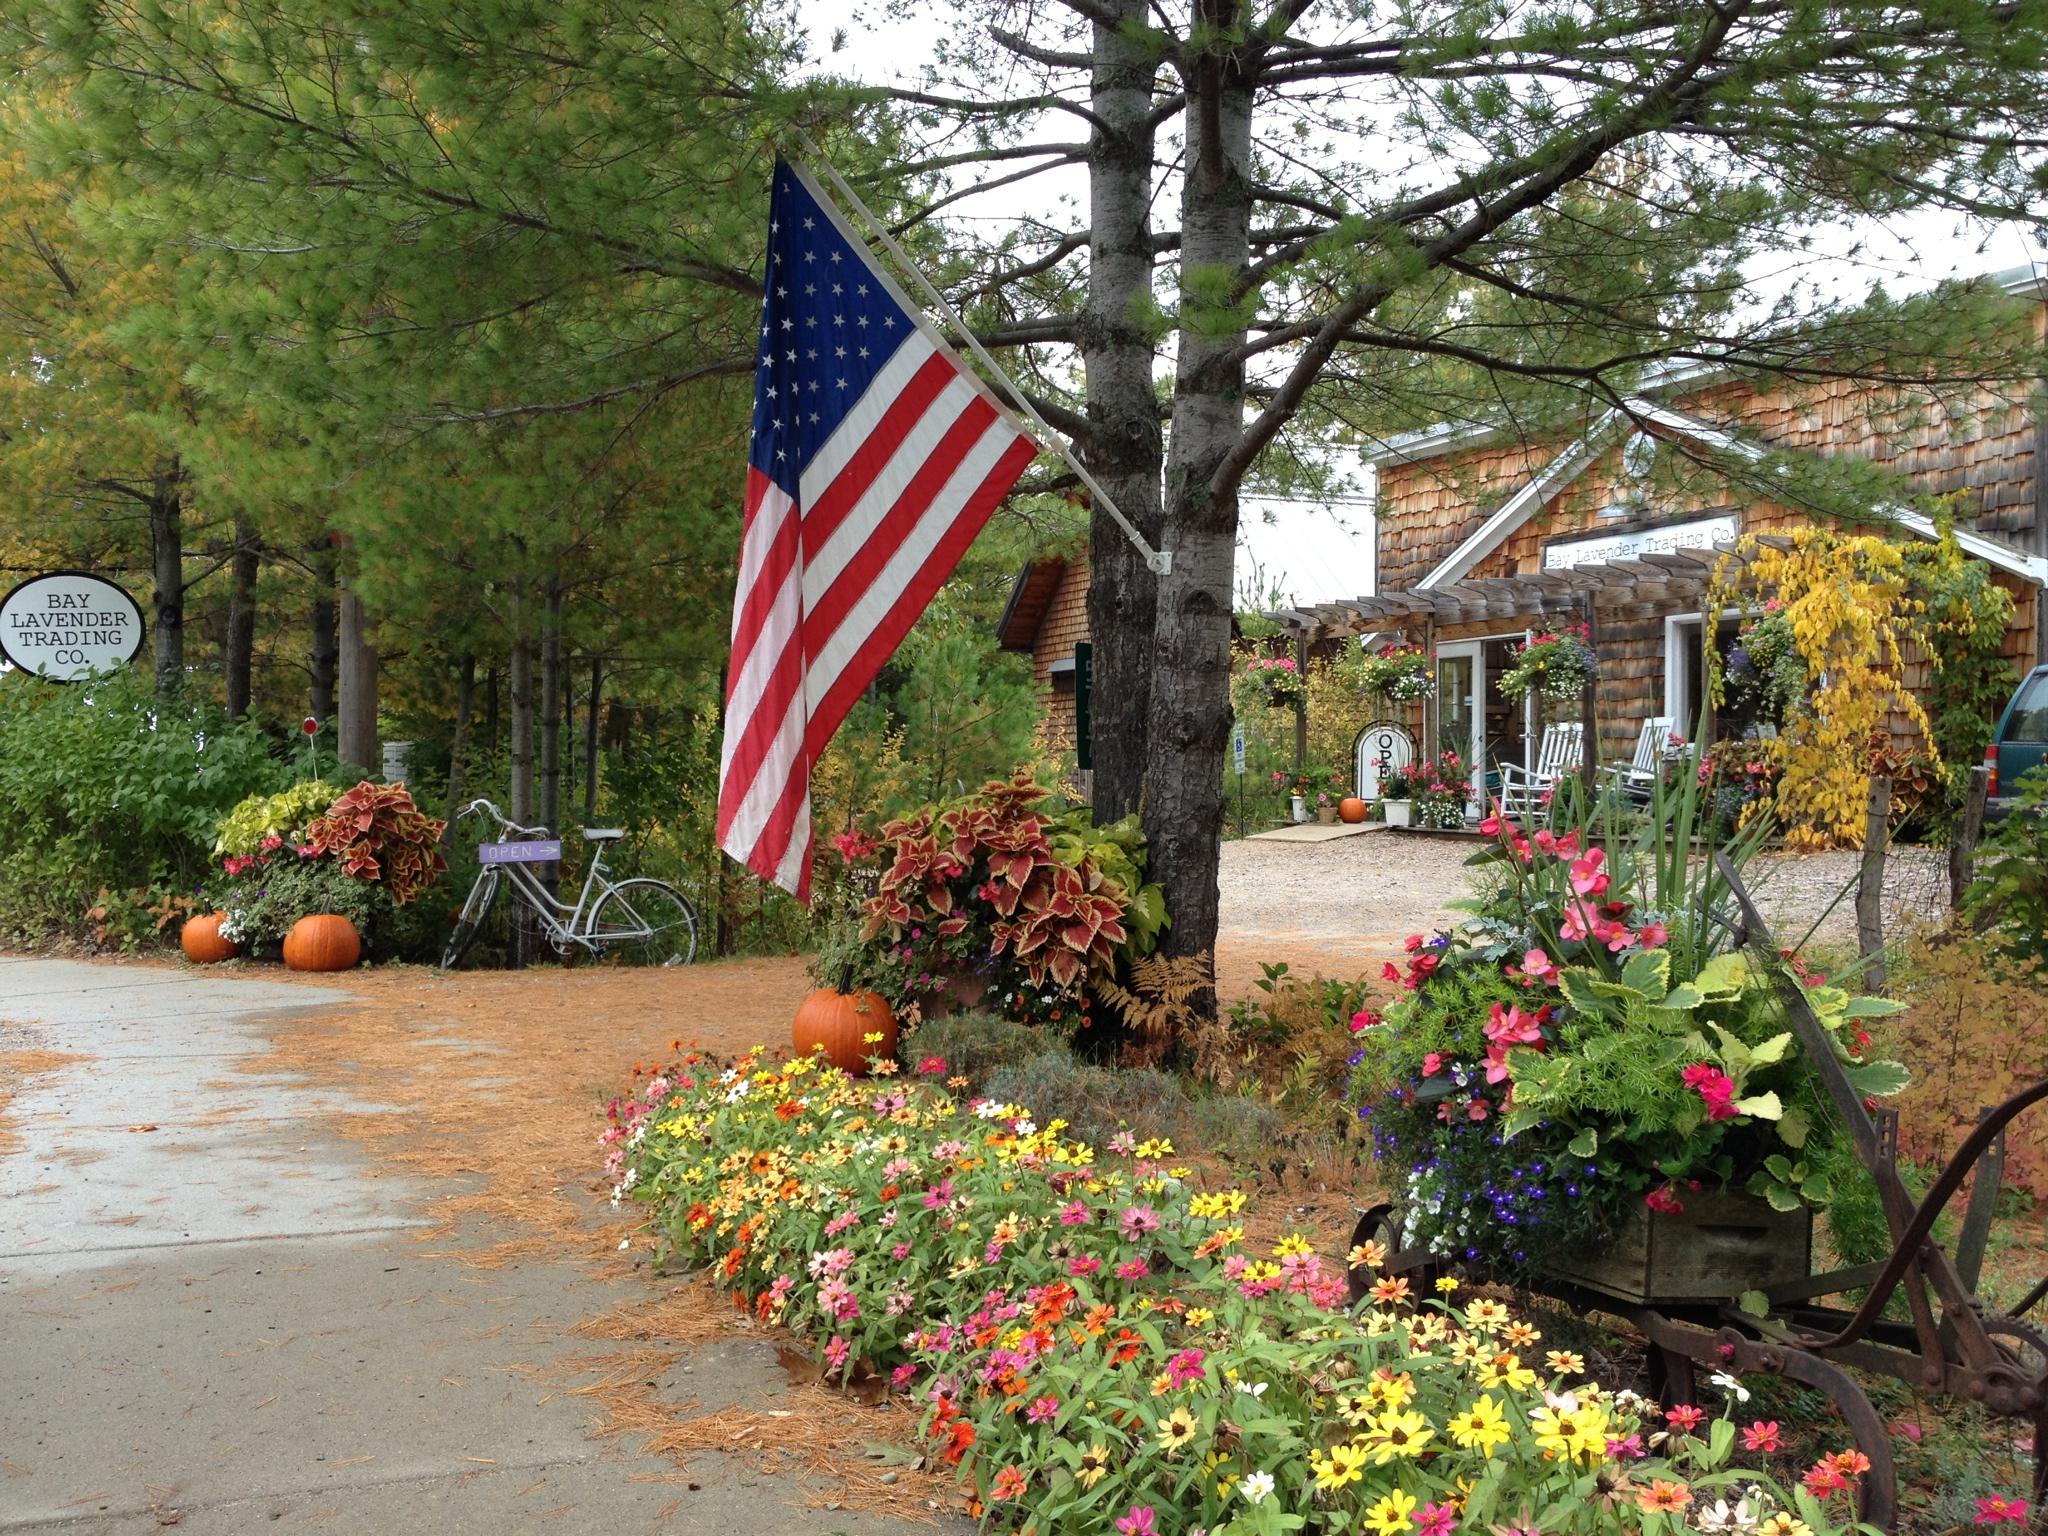 fall gardens outside Bay Lavender storefront